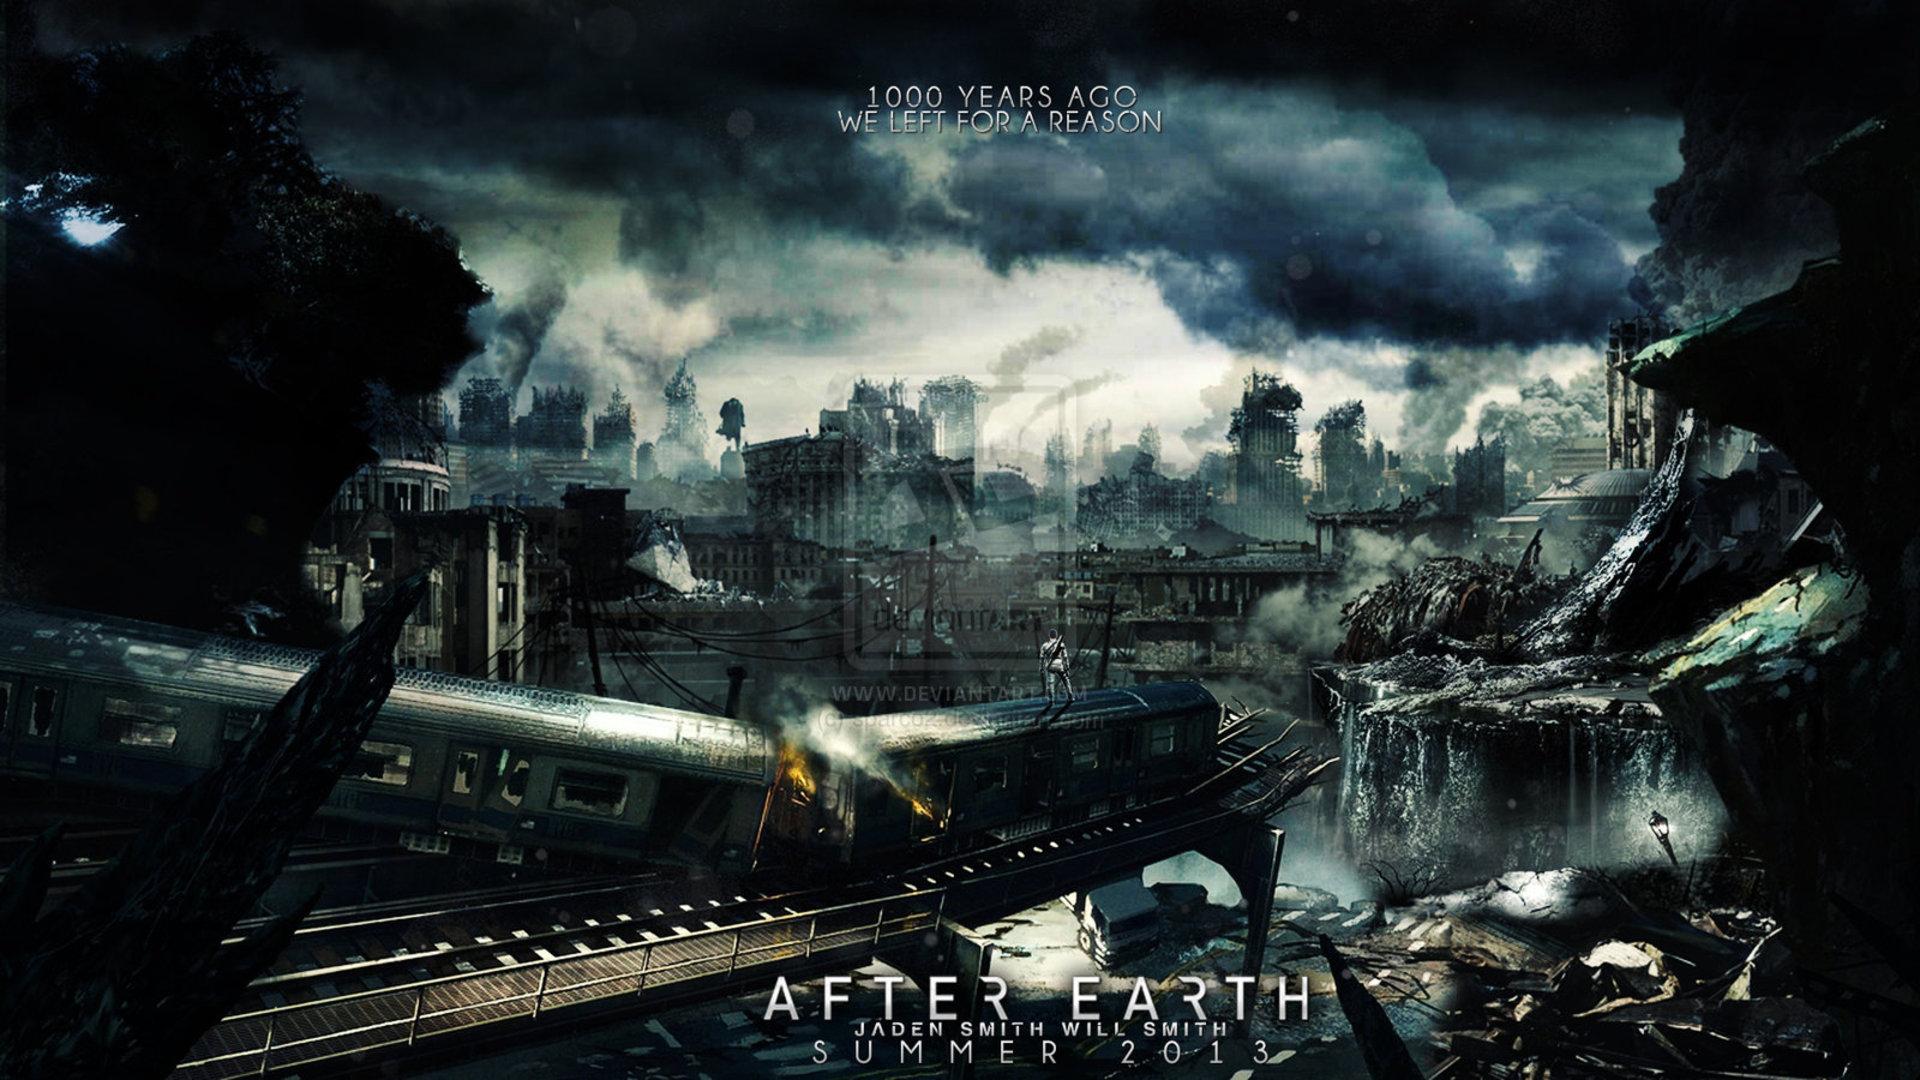 After Earth Wallpaper 9   1920 X 1080 stmednet 1920x1080